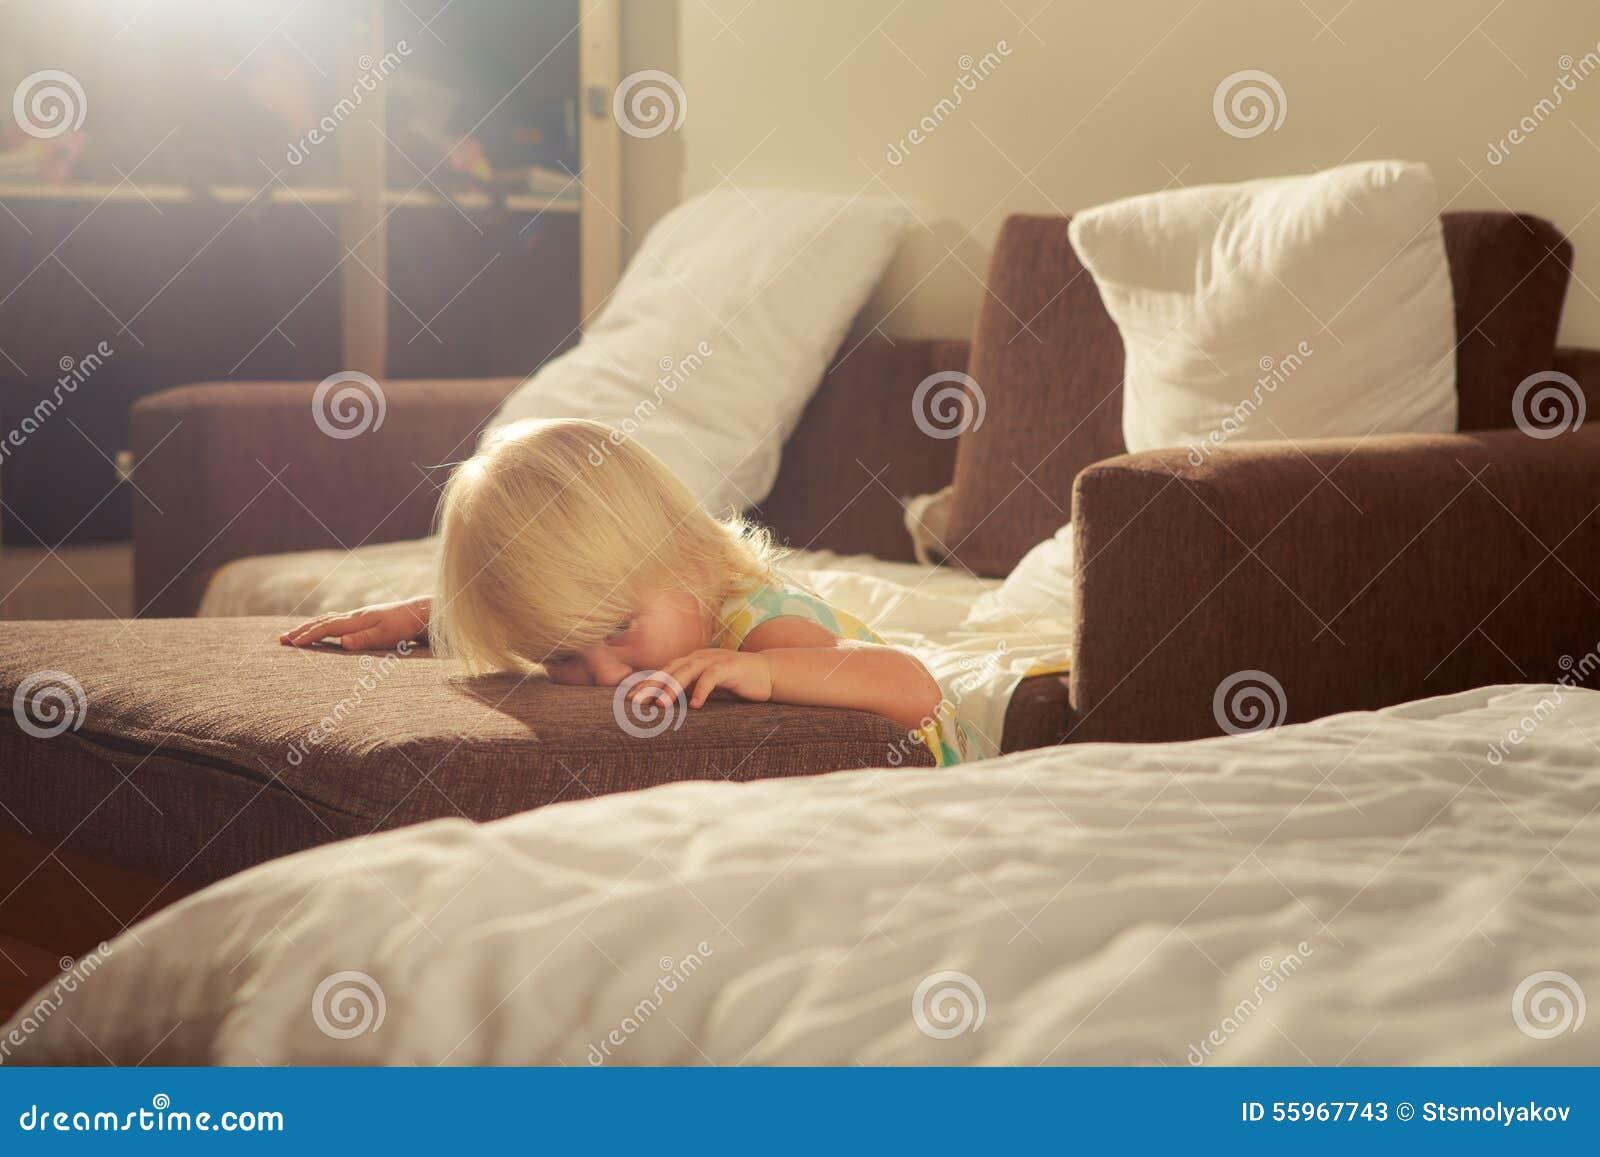 Little Blonde Girl Stands Near Sofa Against White Pillows